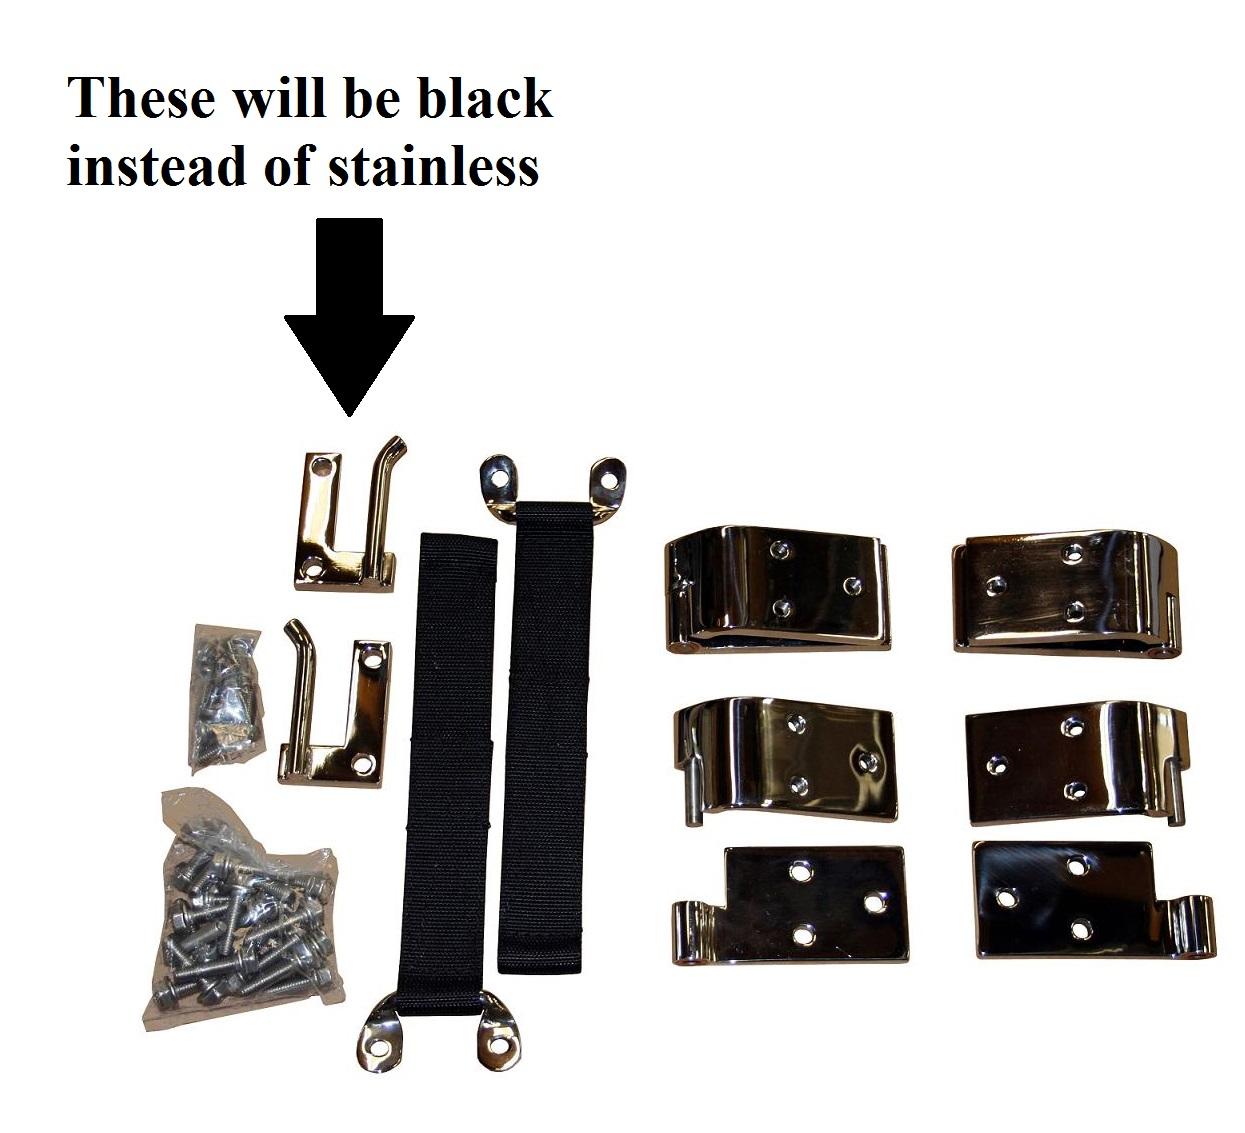 Quick Release Door Hinges - Stainless Steel (set of 4), MisMatched Hardware